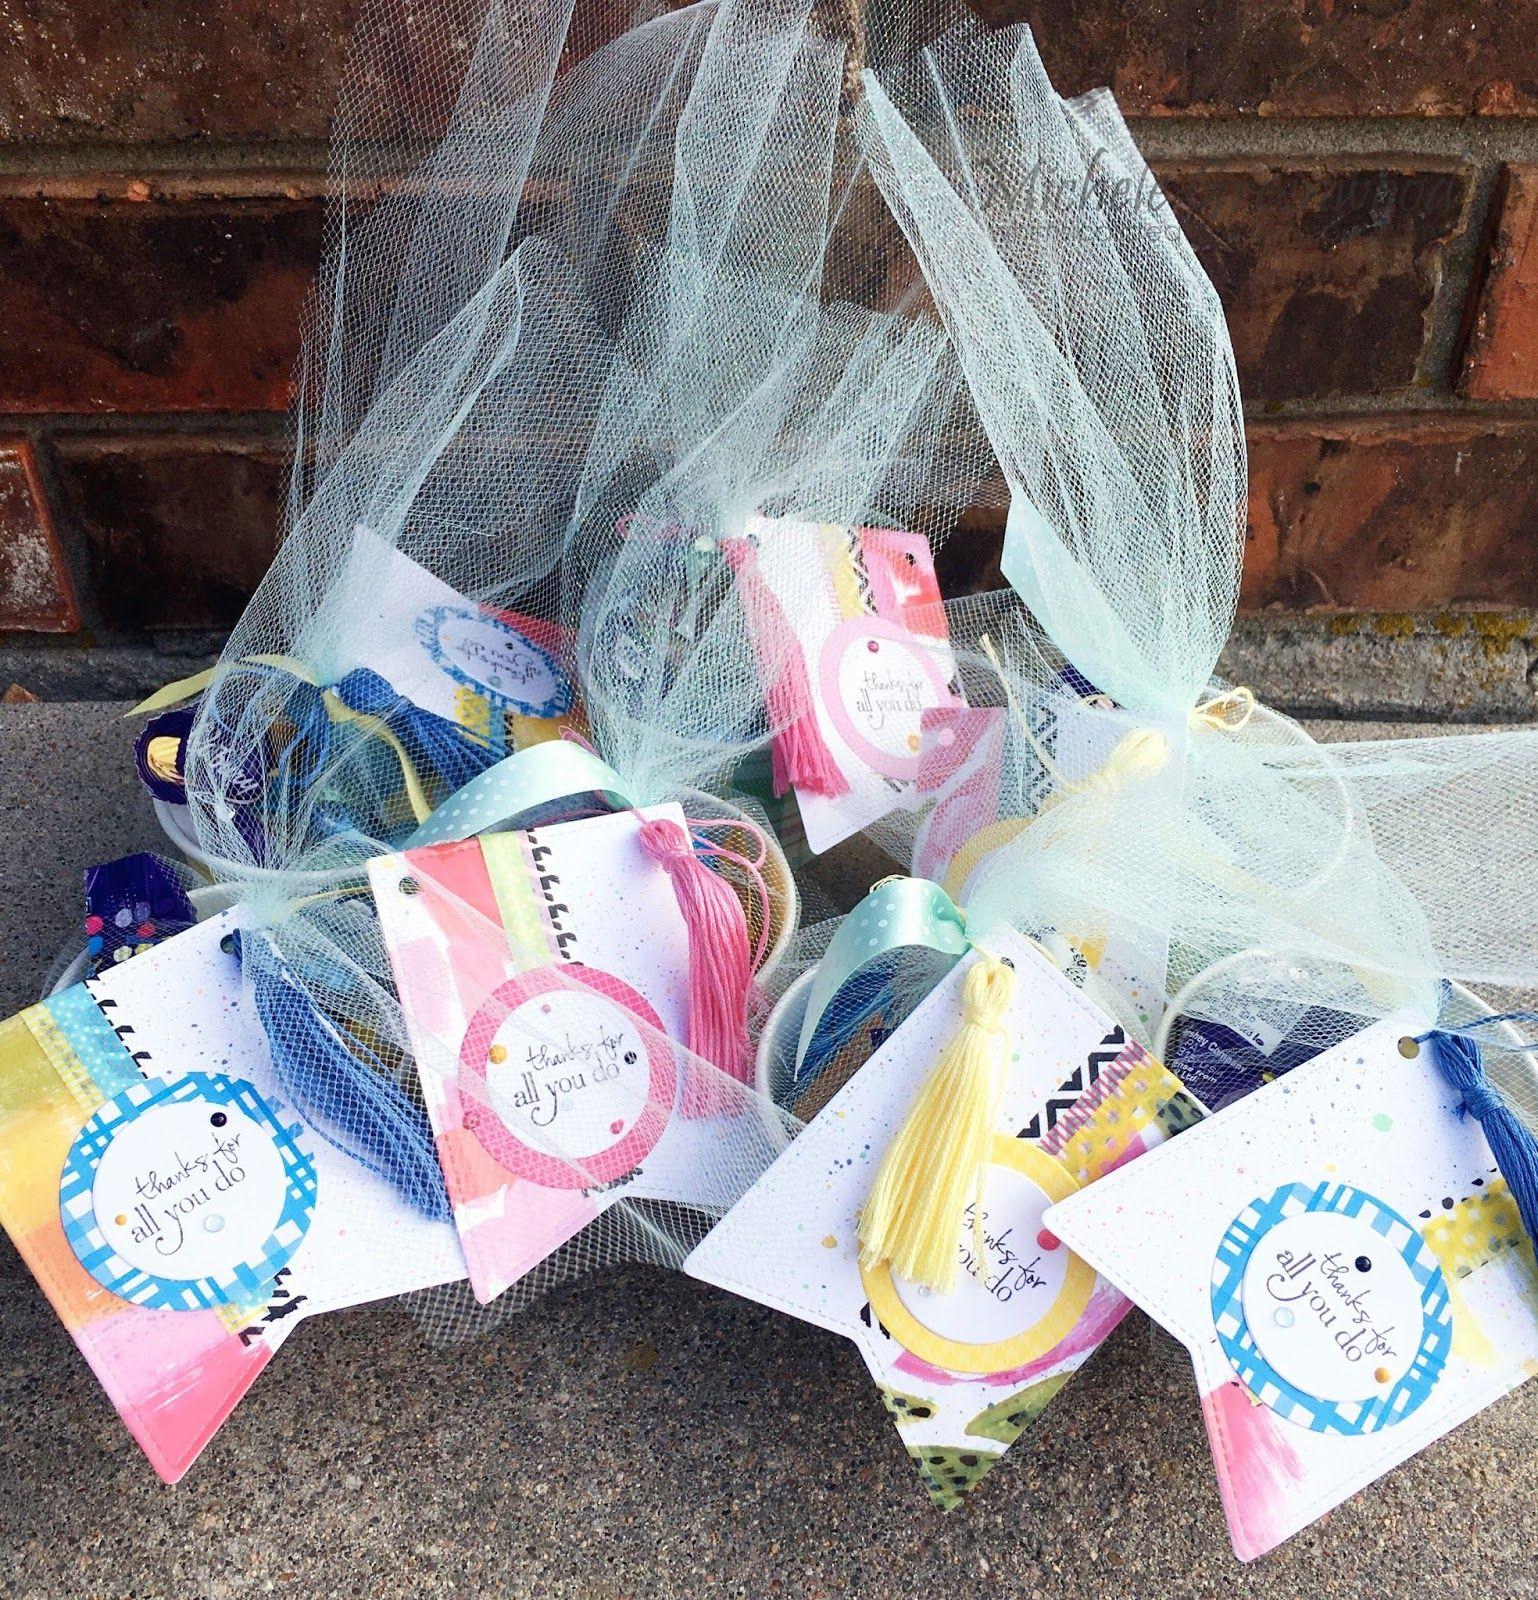 #heroarts #tags #handmade #tassels #handmadetassels #verve #thanks #candy #eastertreats #tulle #spring